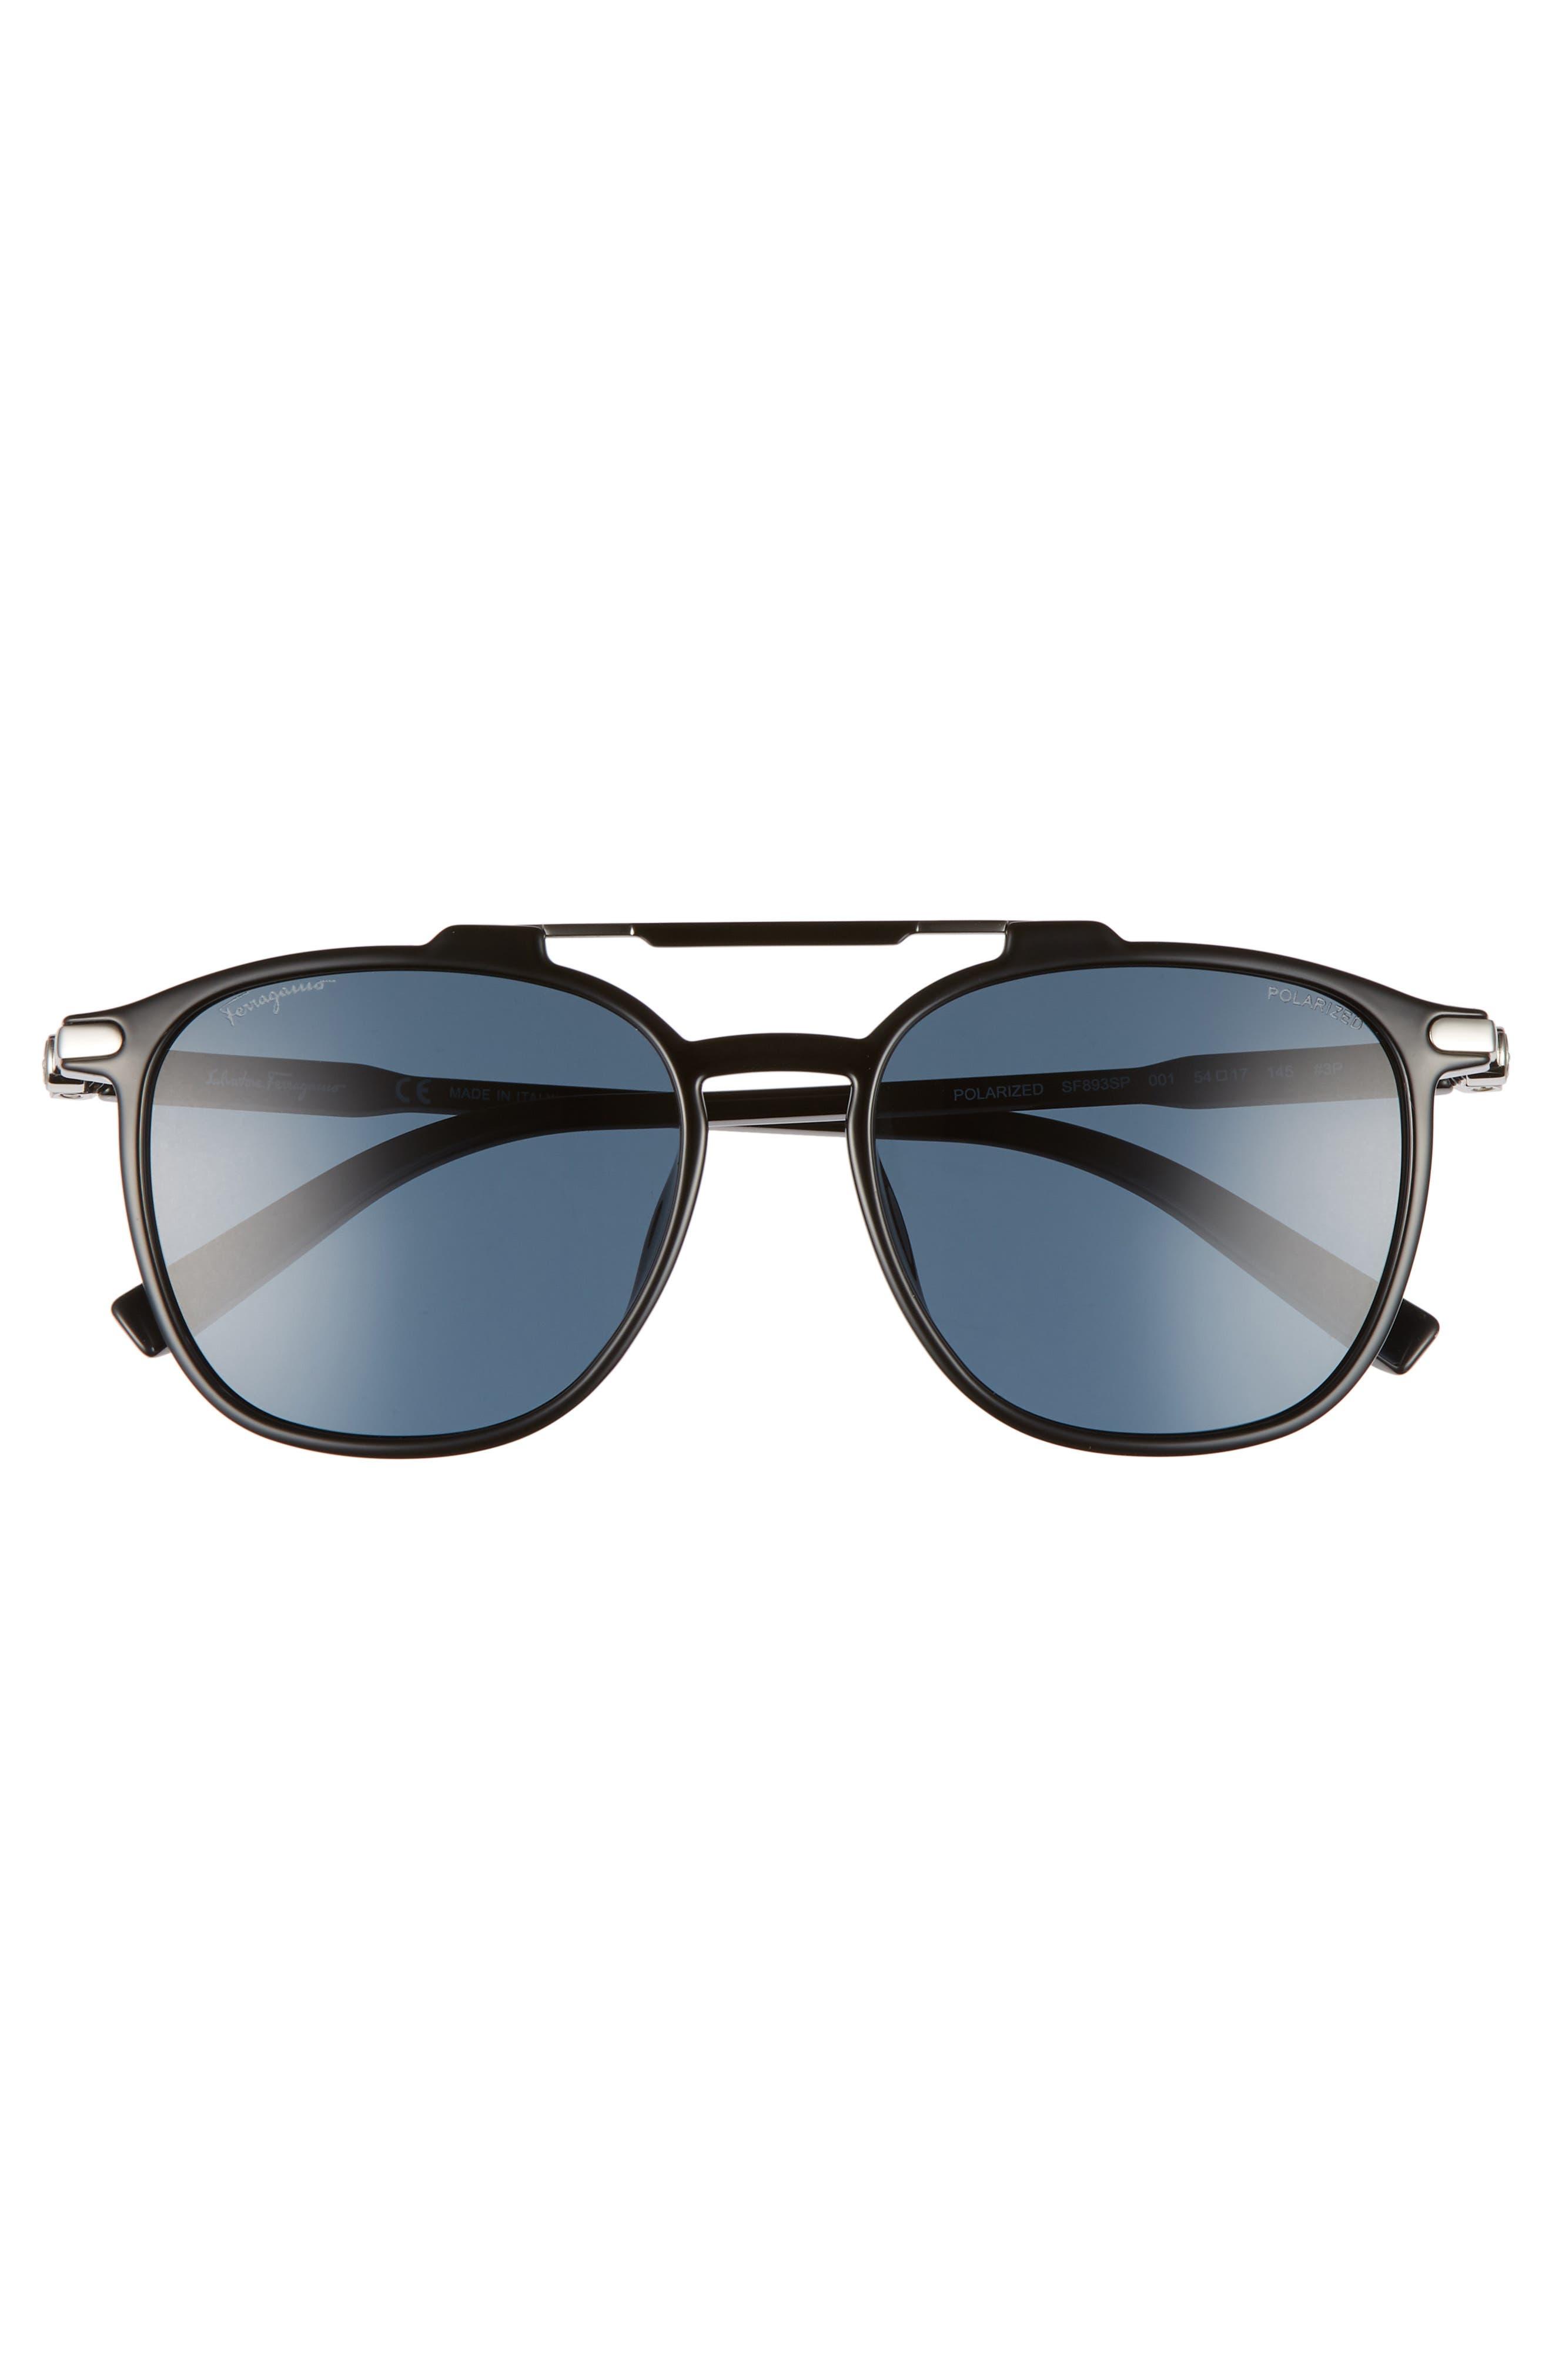 Double Gancio 54mm Polarized Sunglasses,                             Alternate thumbnail 2, color,                             BLACK